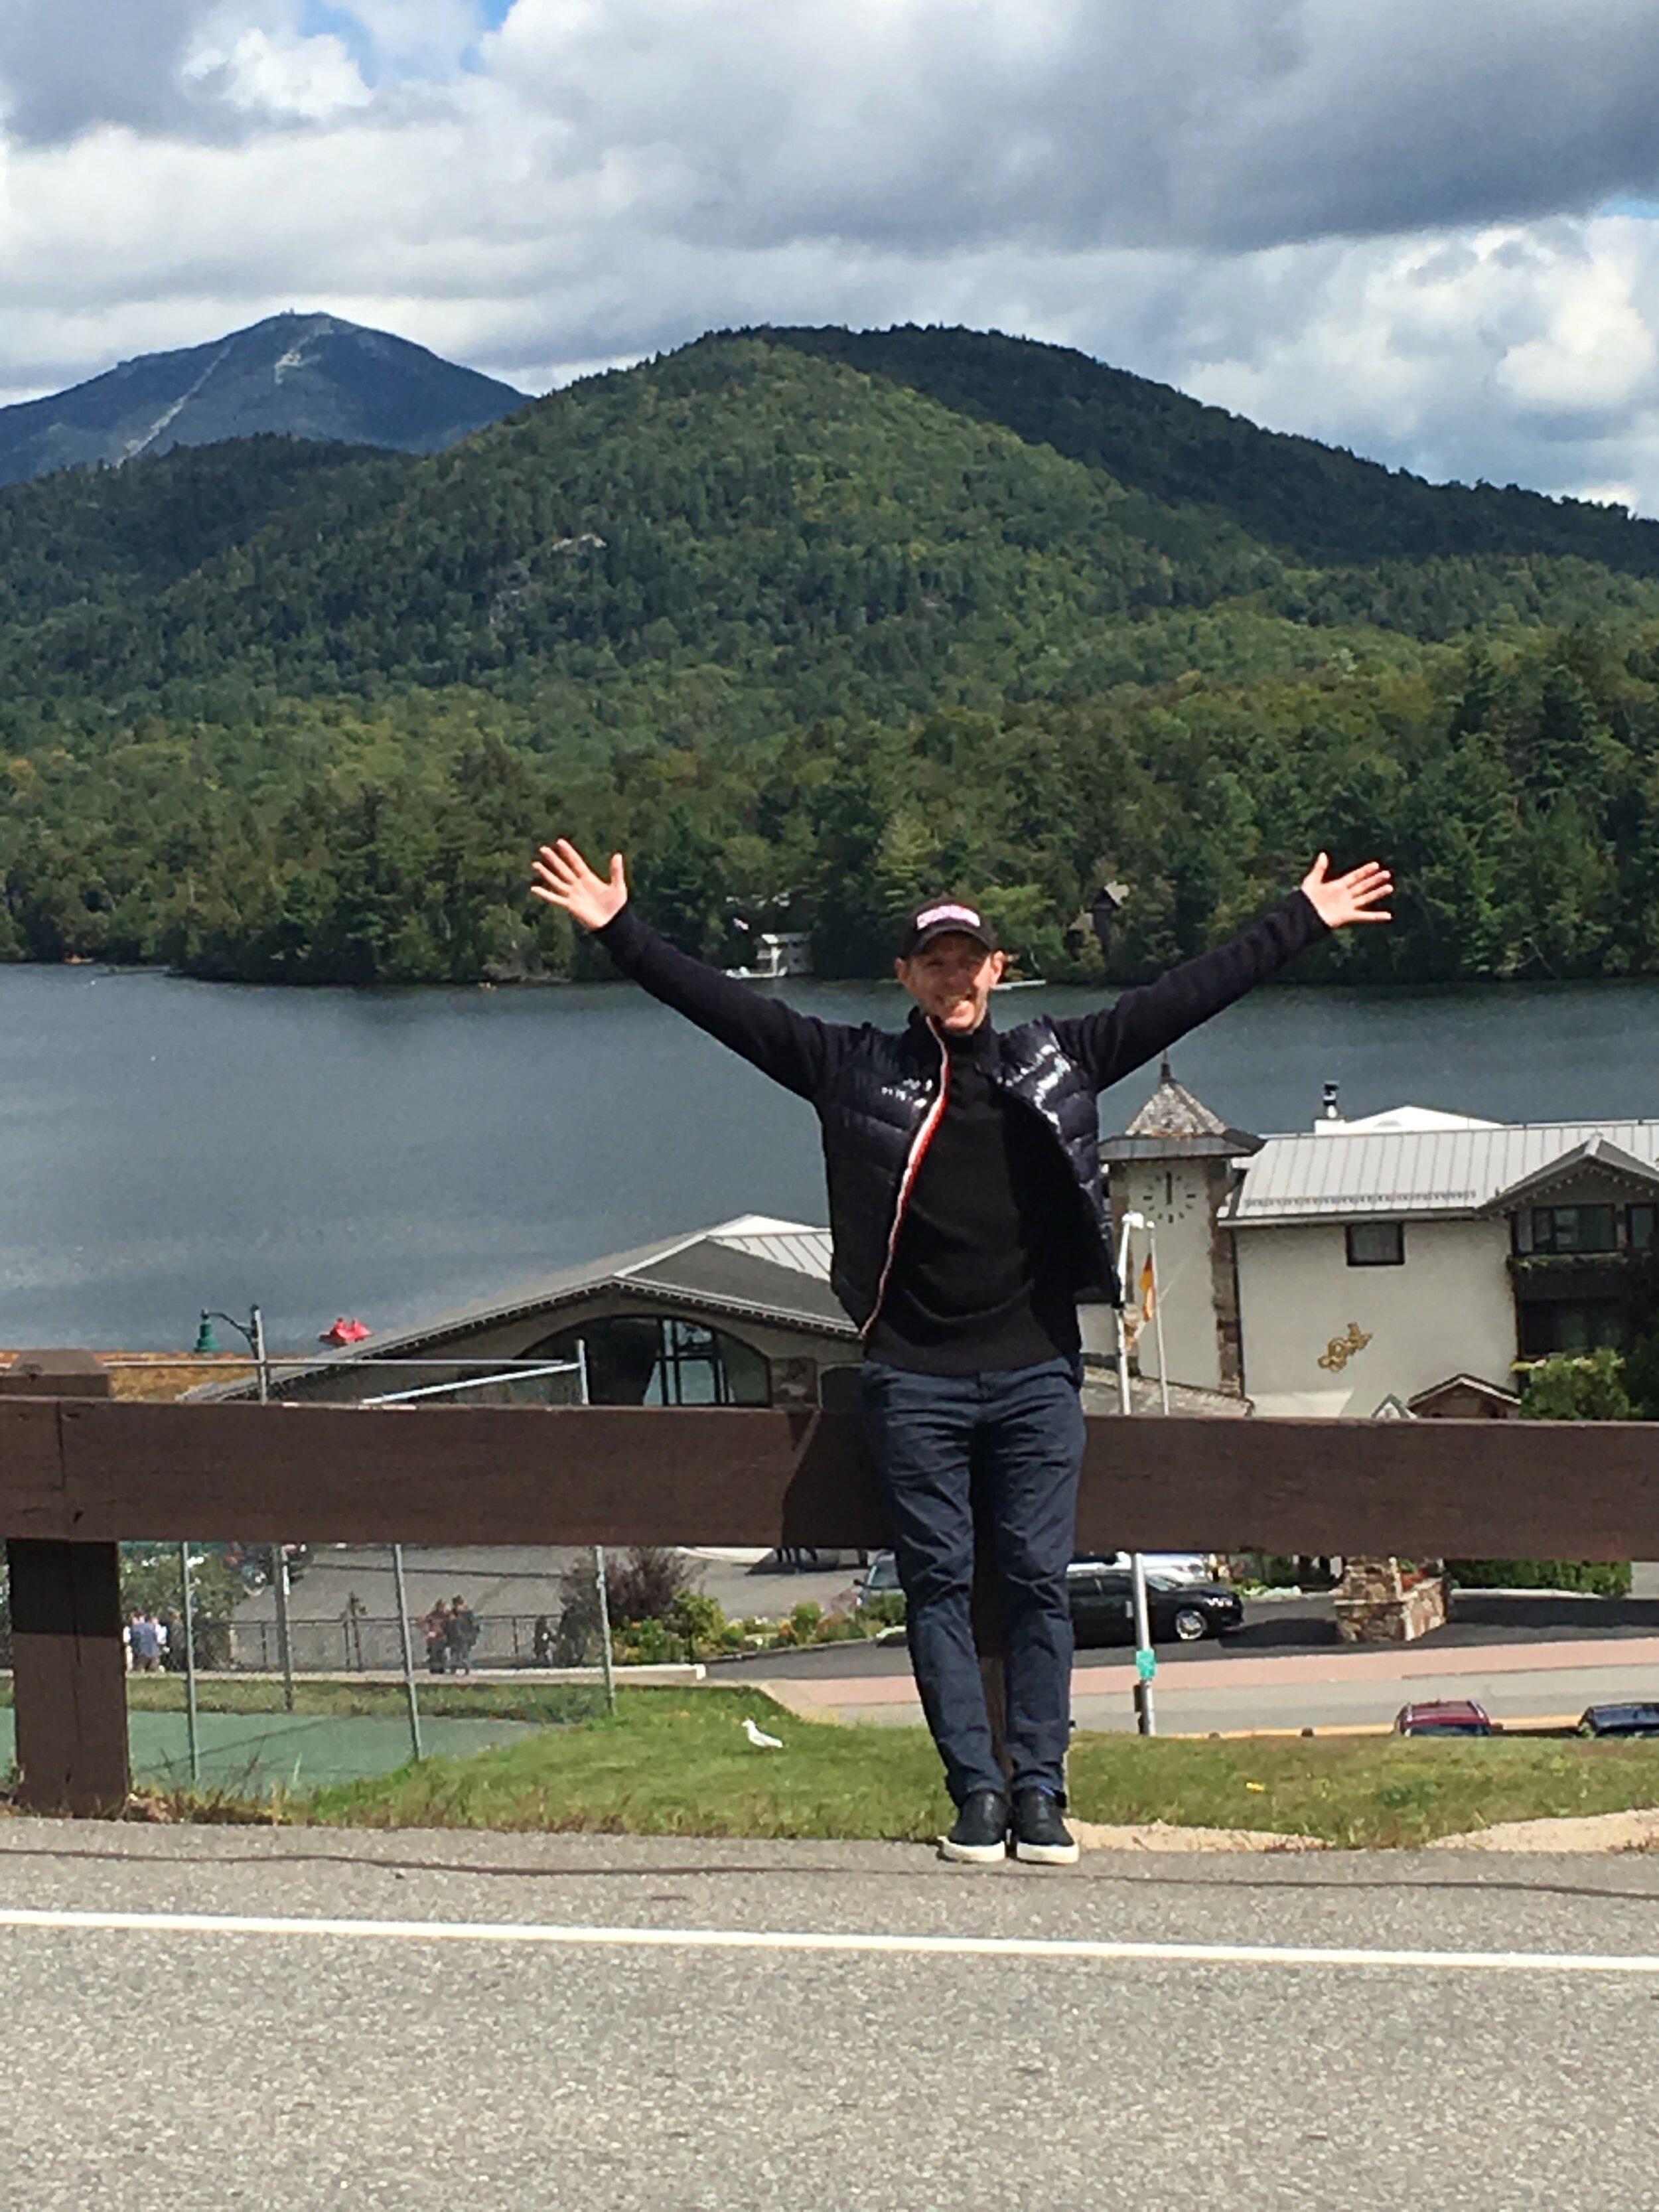 Neil enjoying some sunshine at the ISU JGP Lake Placid!